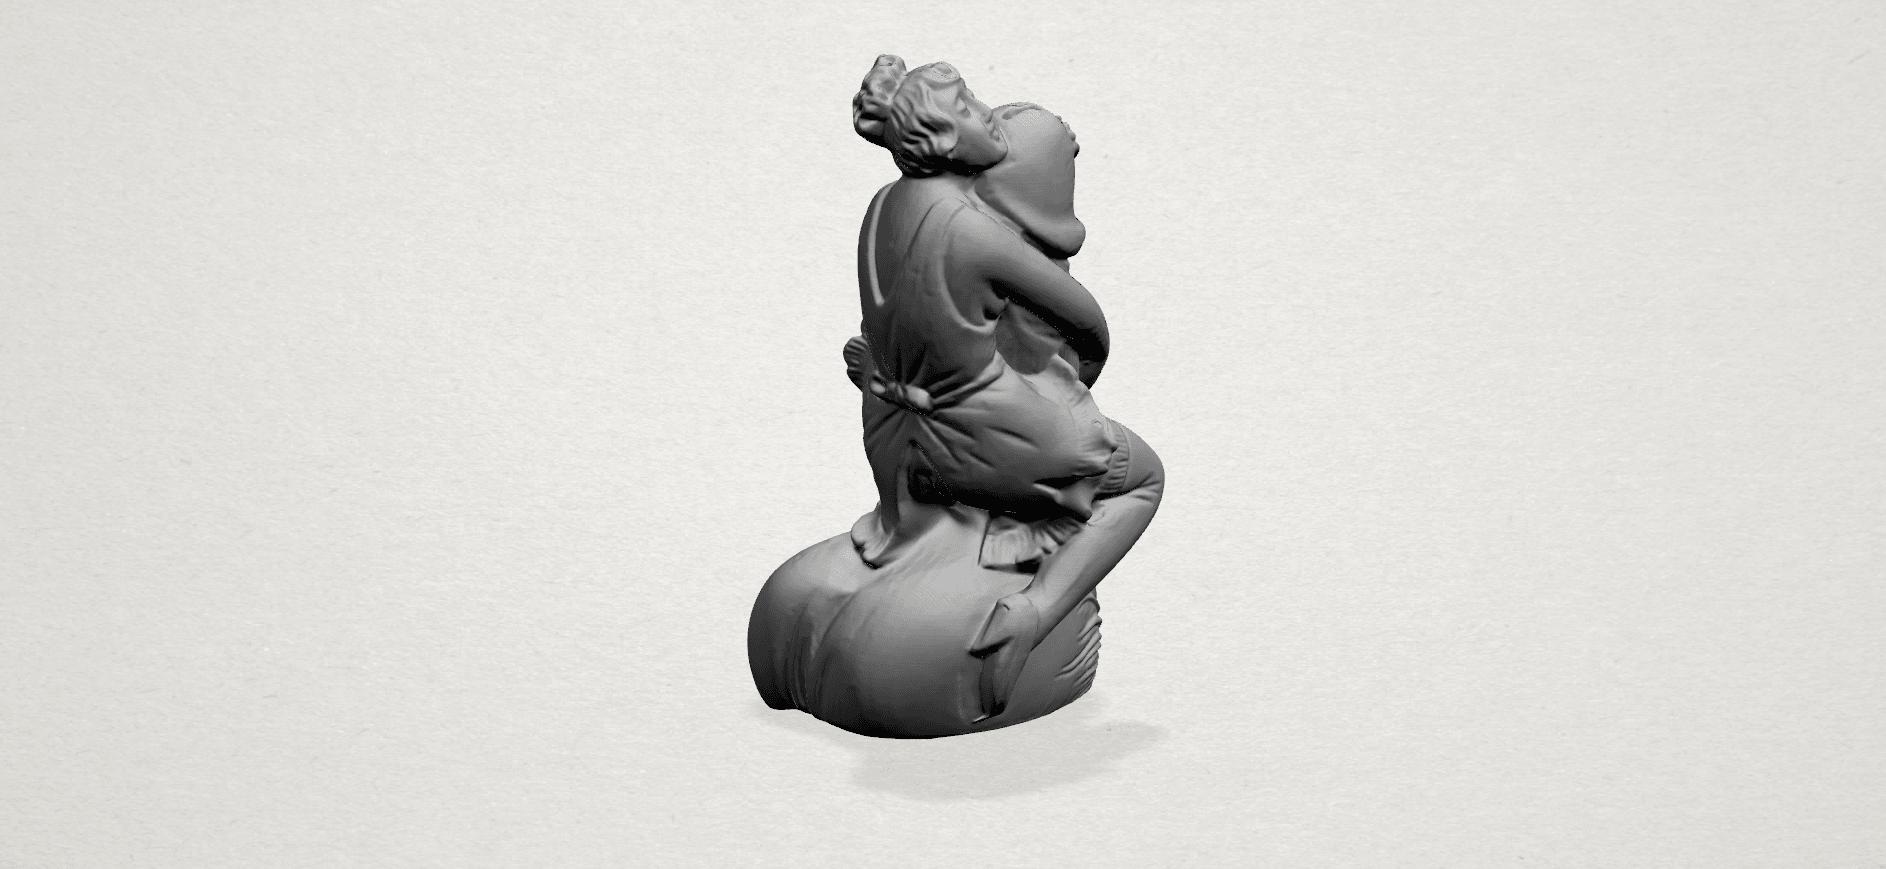 Alice hugging Dick - A04.png Download free STL file Alice hugging Dick • 3D printer design, GeorgesNikkei